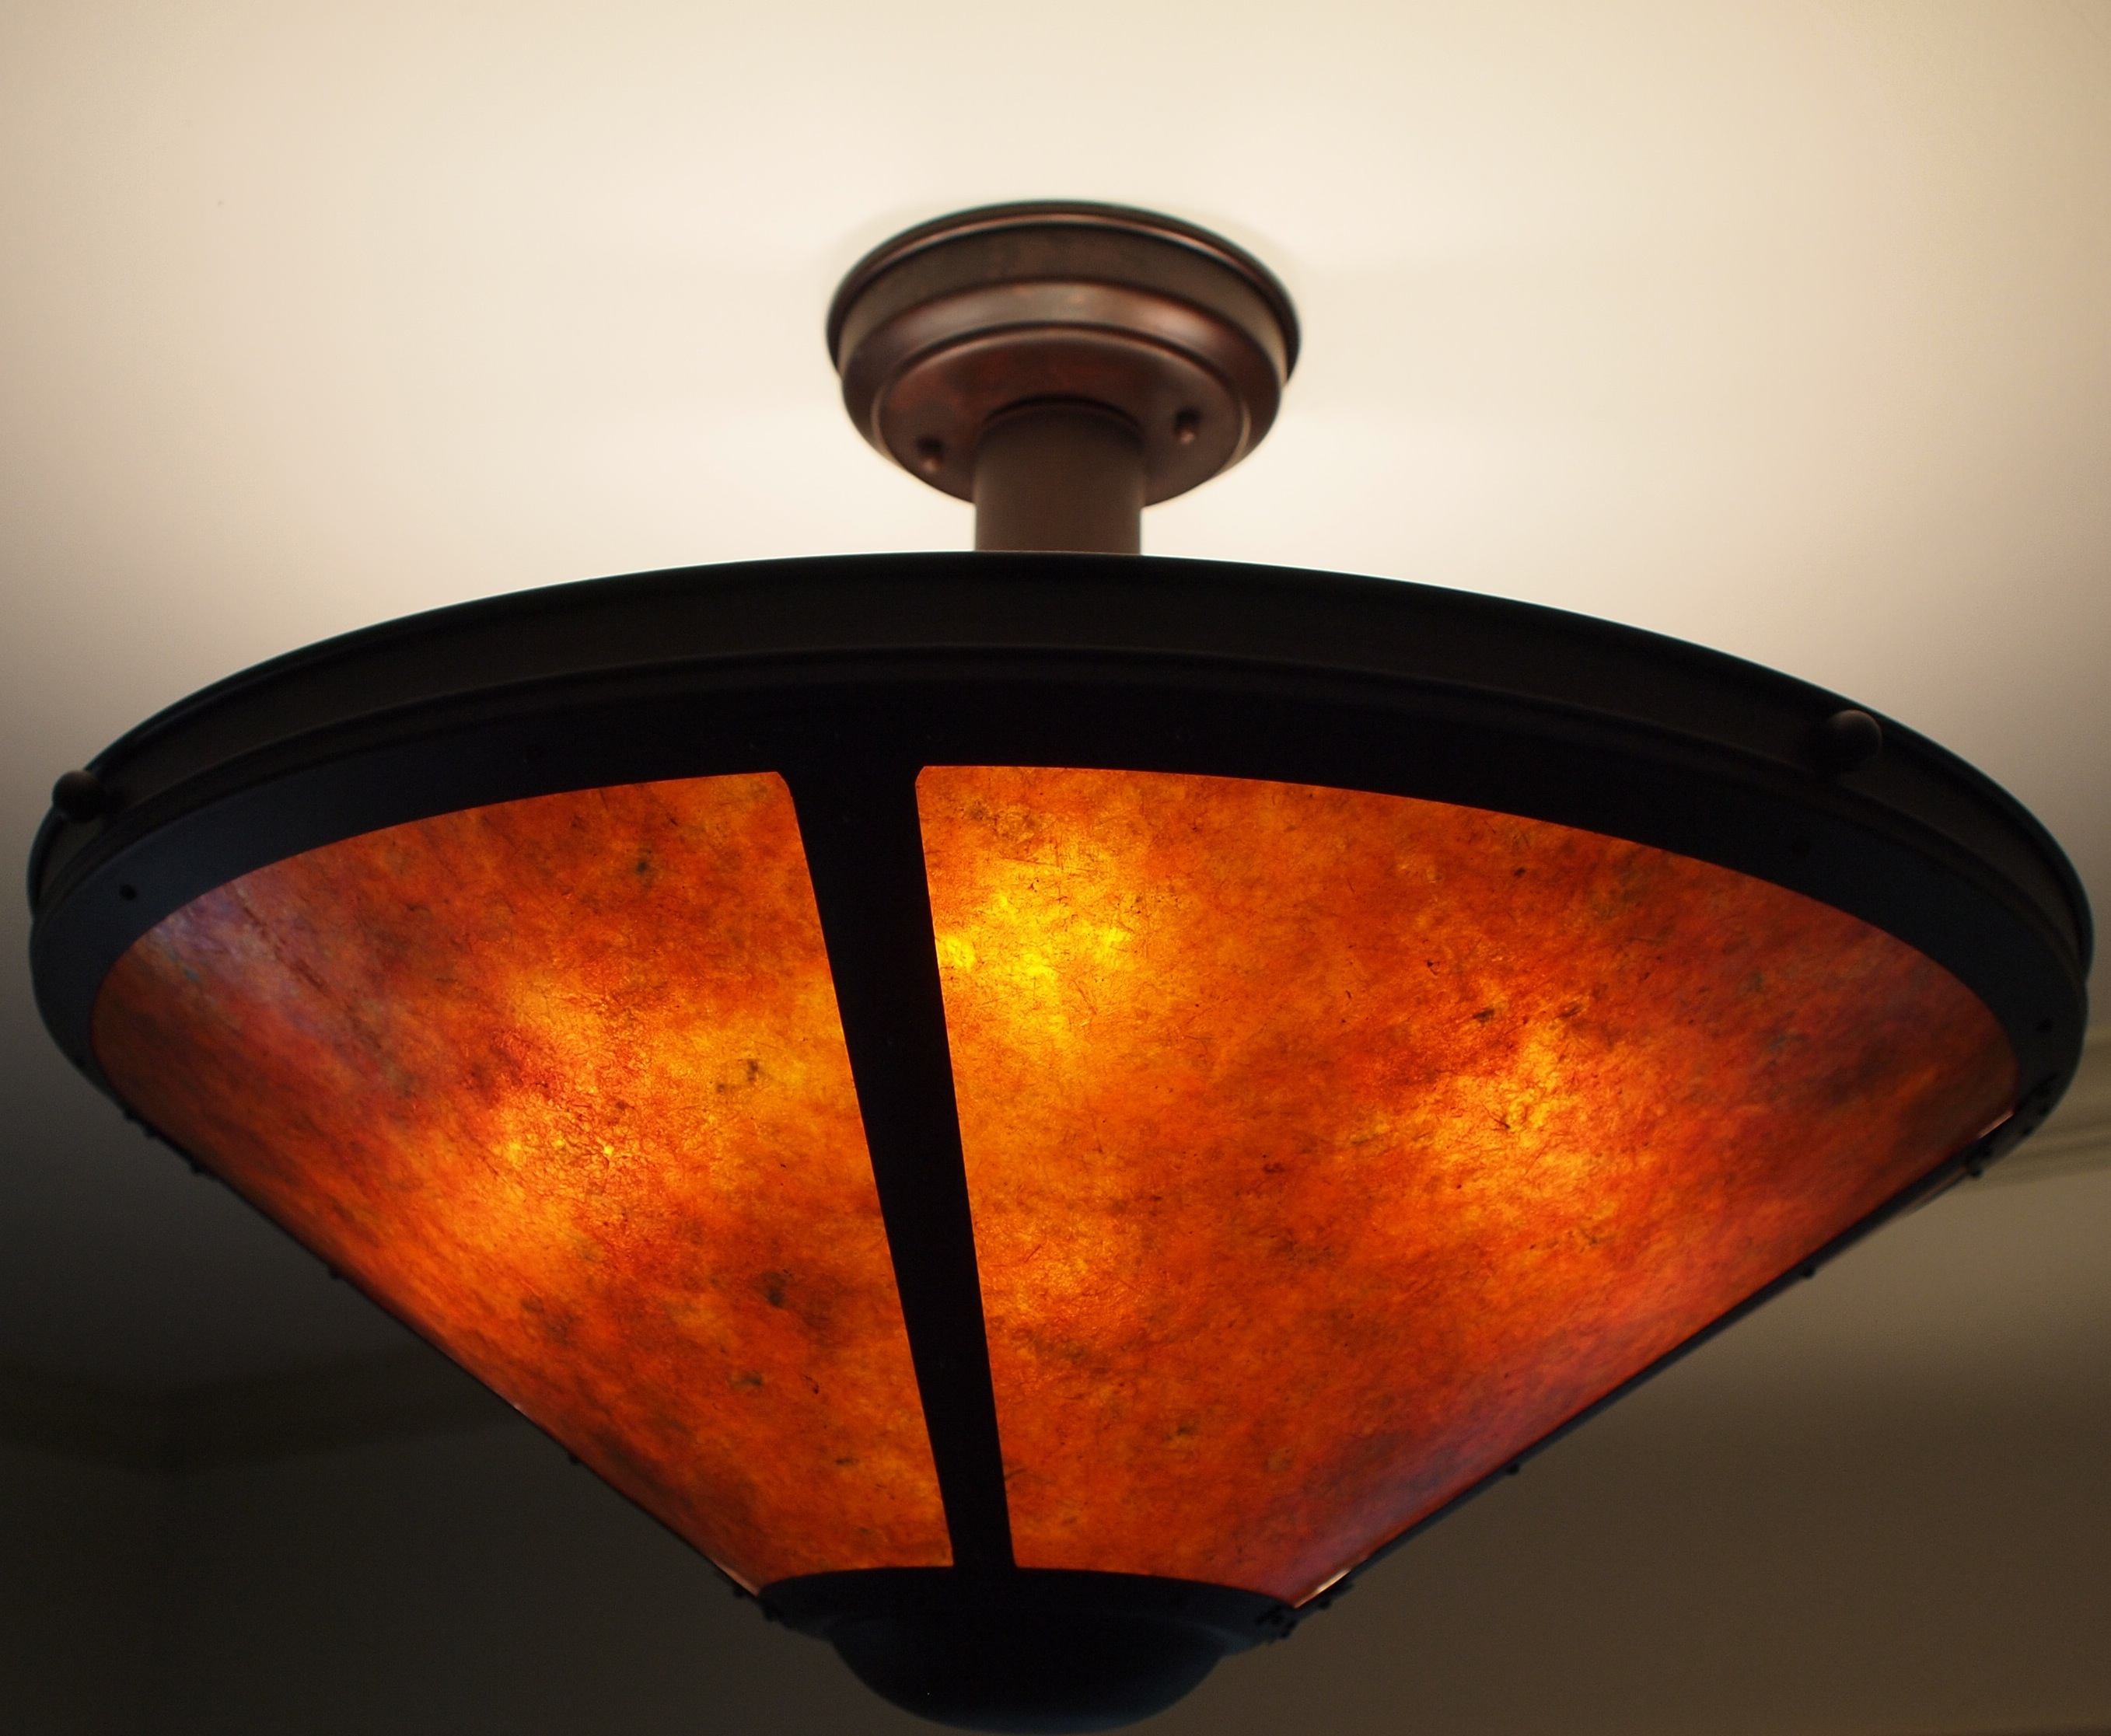 Mica Lamp Company chandelier, model #113, $1100